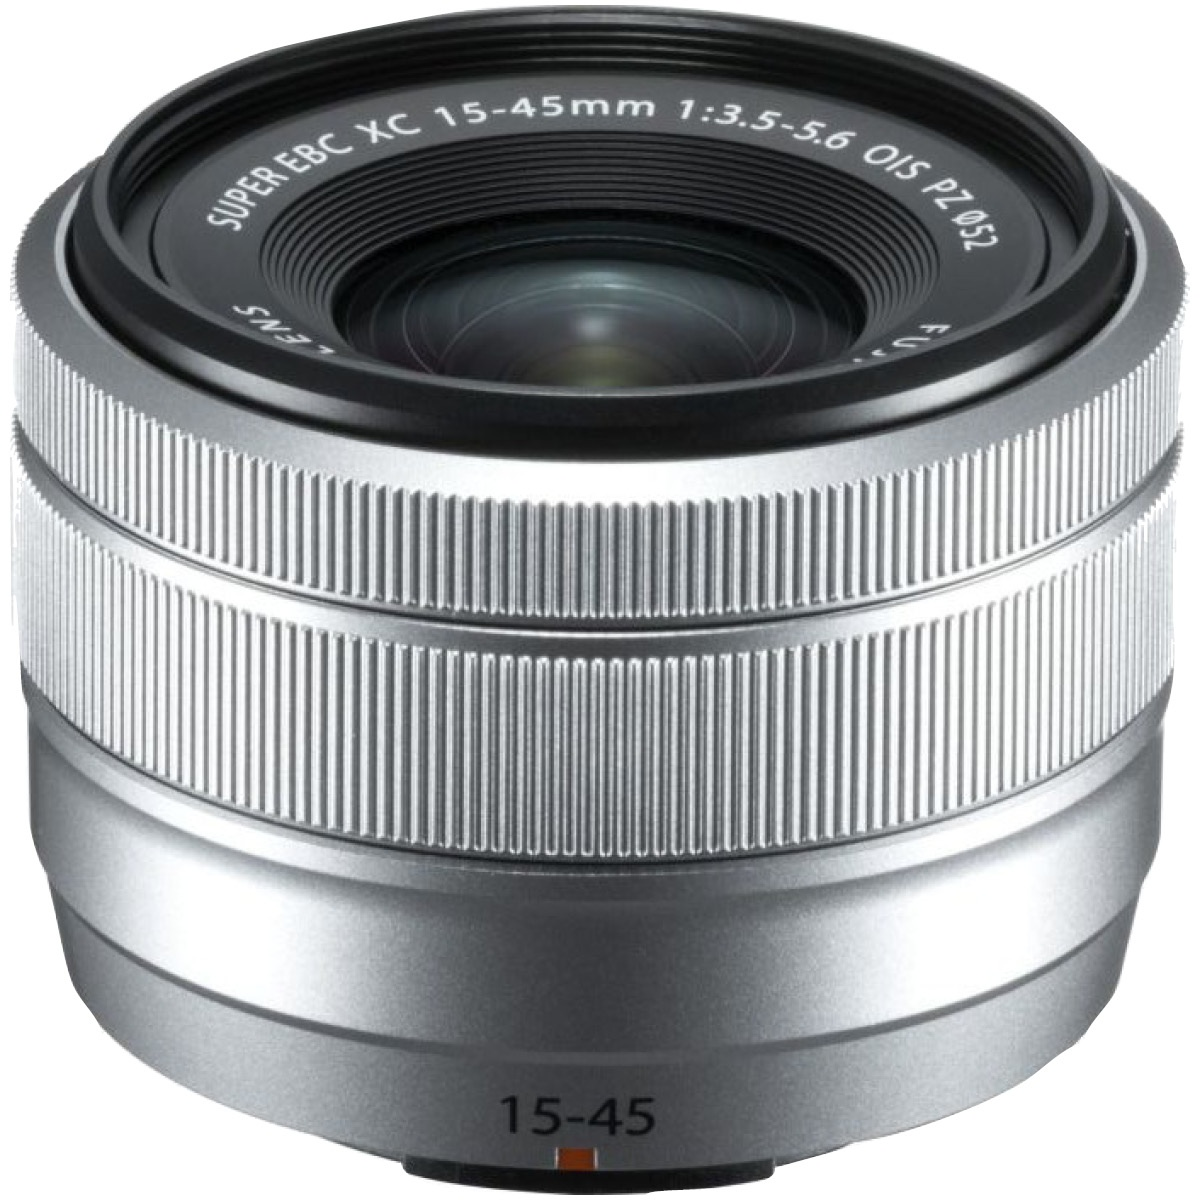 Fujifilm XC 15-45 mm 1:3,5-5,6 OIS PZ Silber